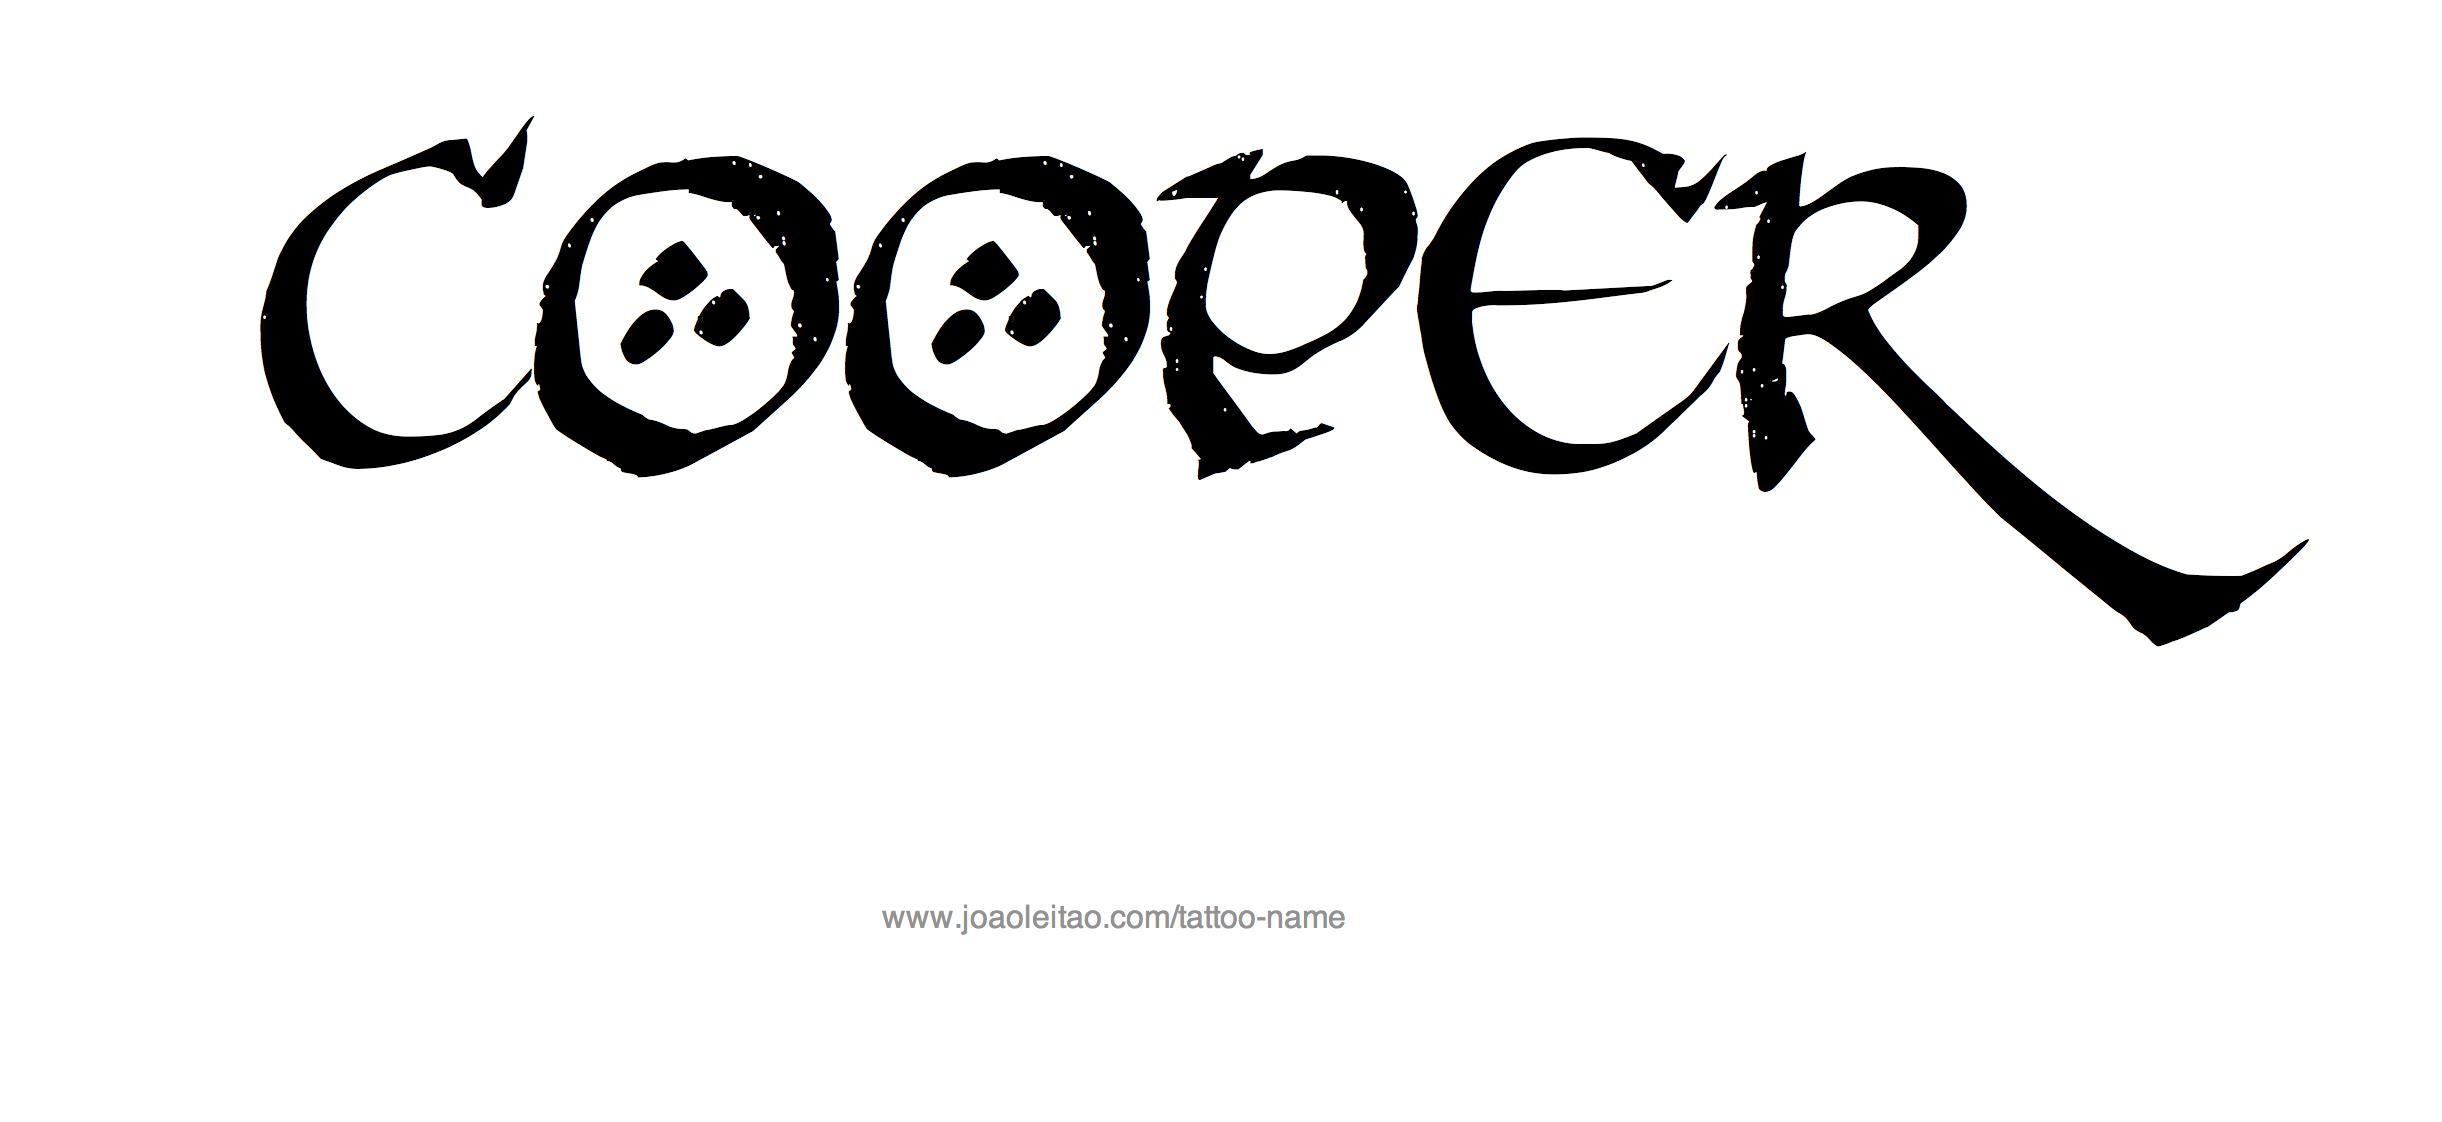 Tattoo Design Name Cooper